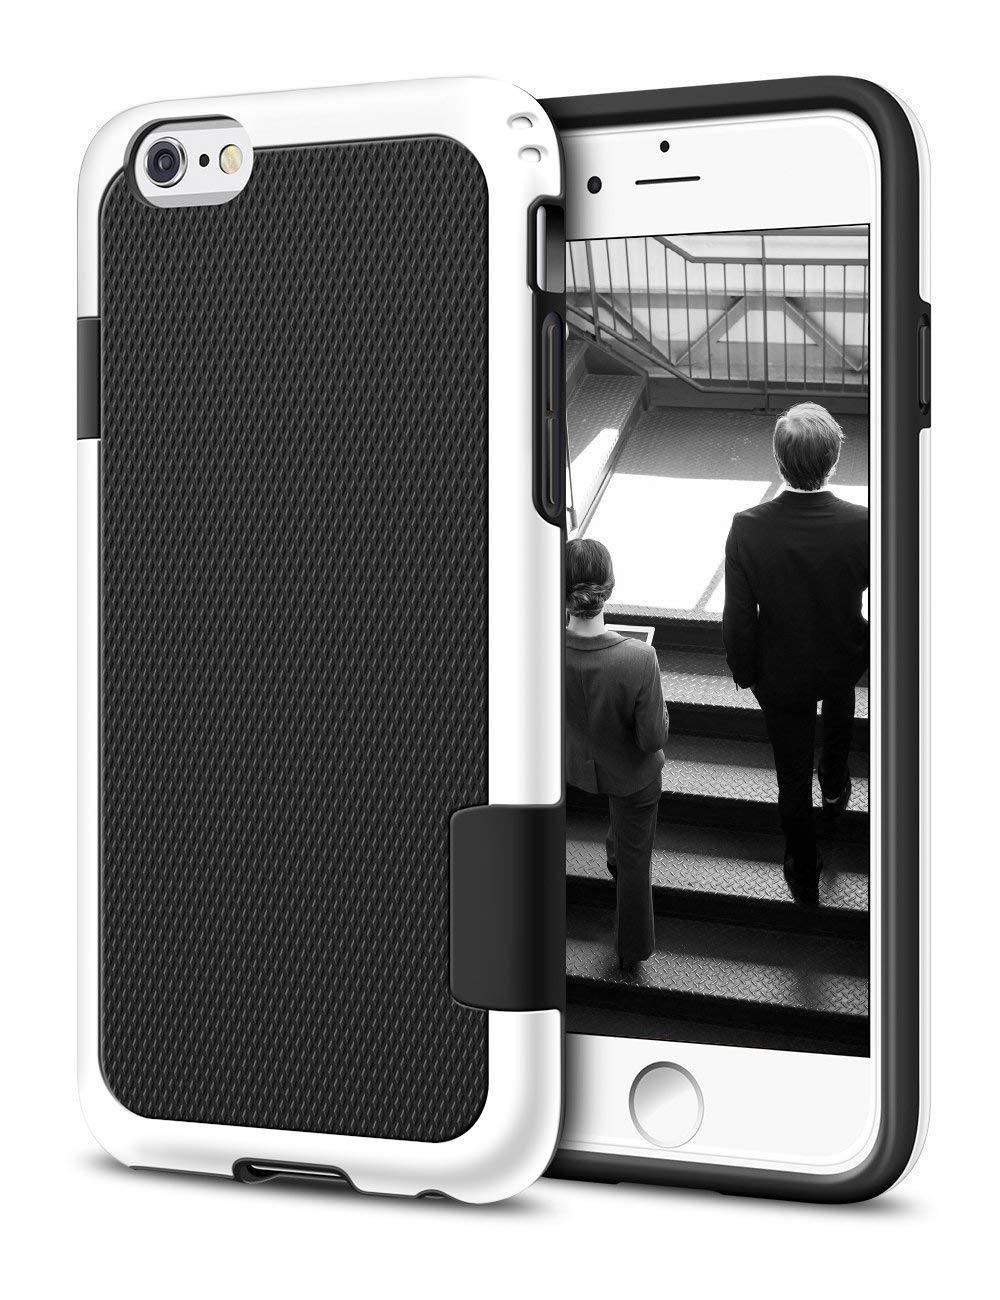 iPhone 6s Plus / 6 Plus Case, LoHi Hybrid Impact 3 Color Shockproof Rugged Case Soft TPU & Hard PC Bumper Anti-slip Cover for Apple iphone 6s Plus 5.5 Inch - Black